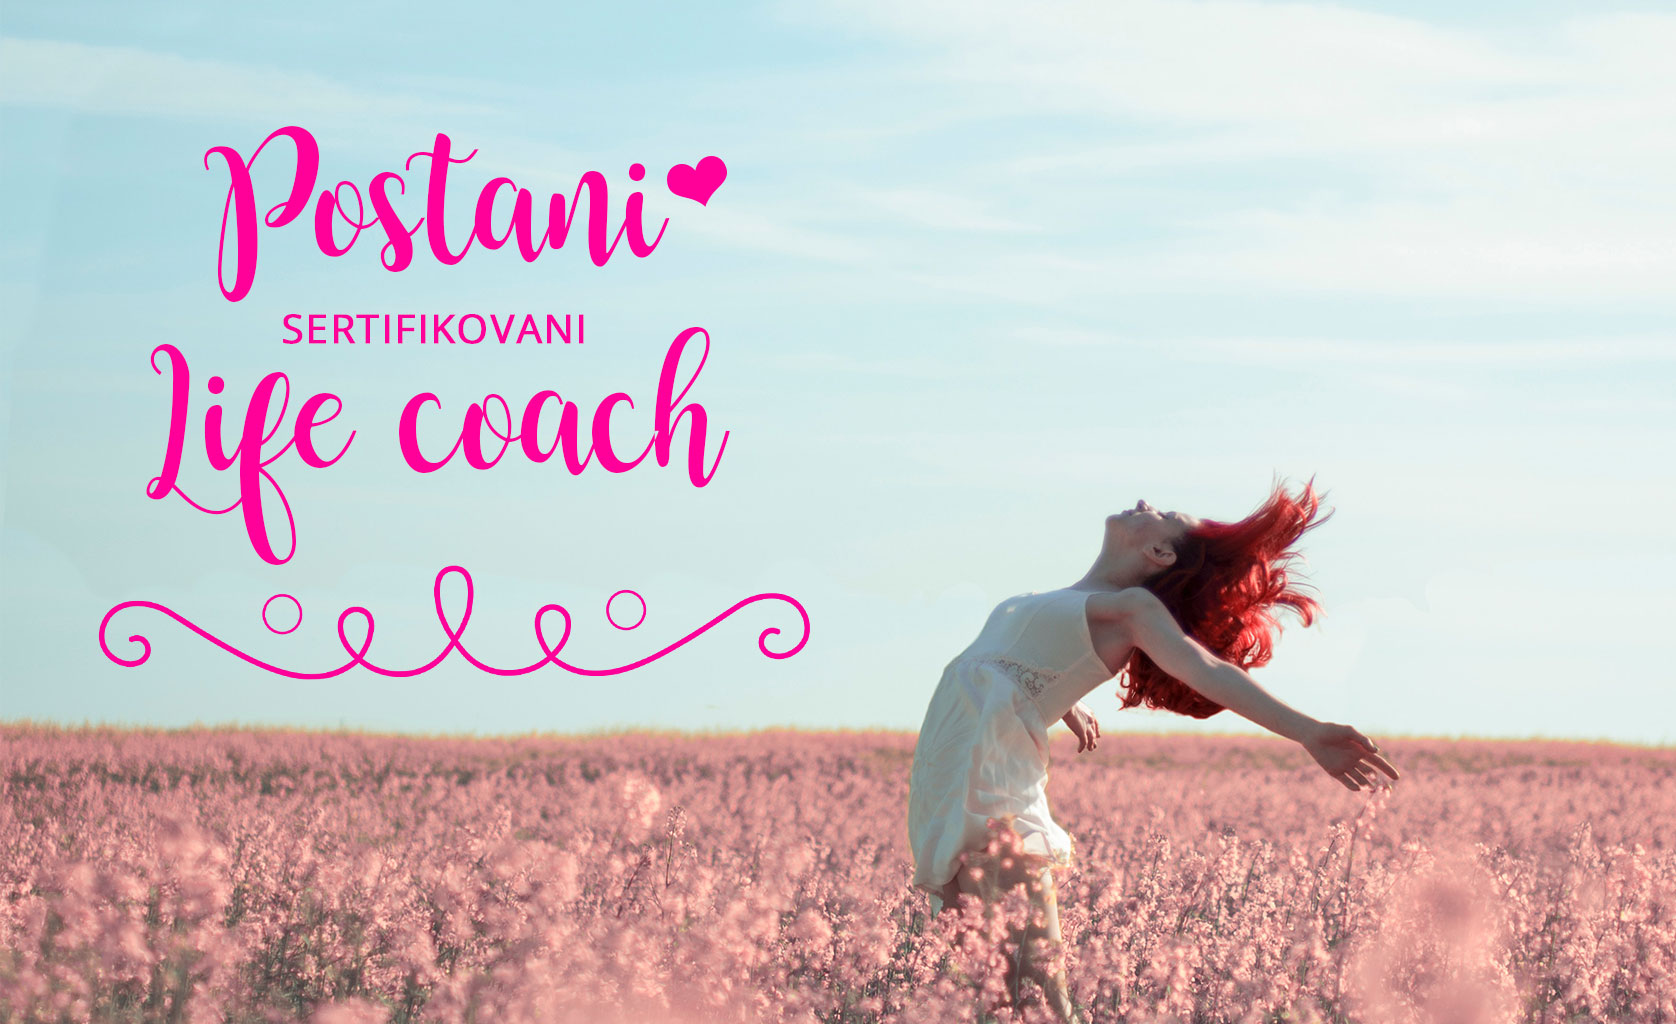 Postani sertifikovani life coach